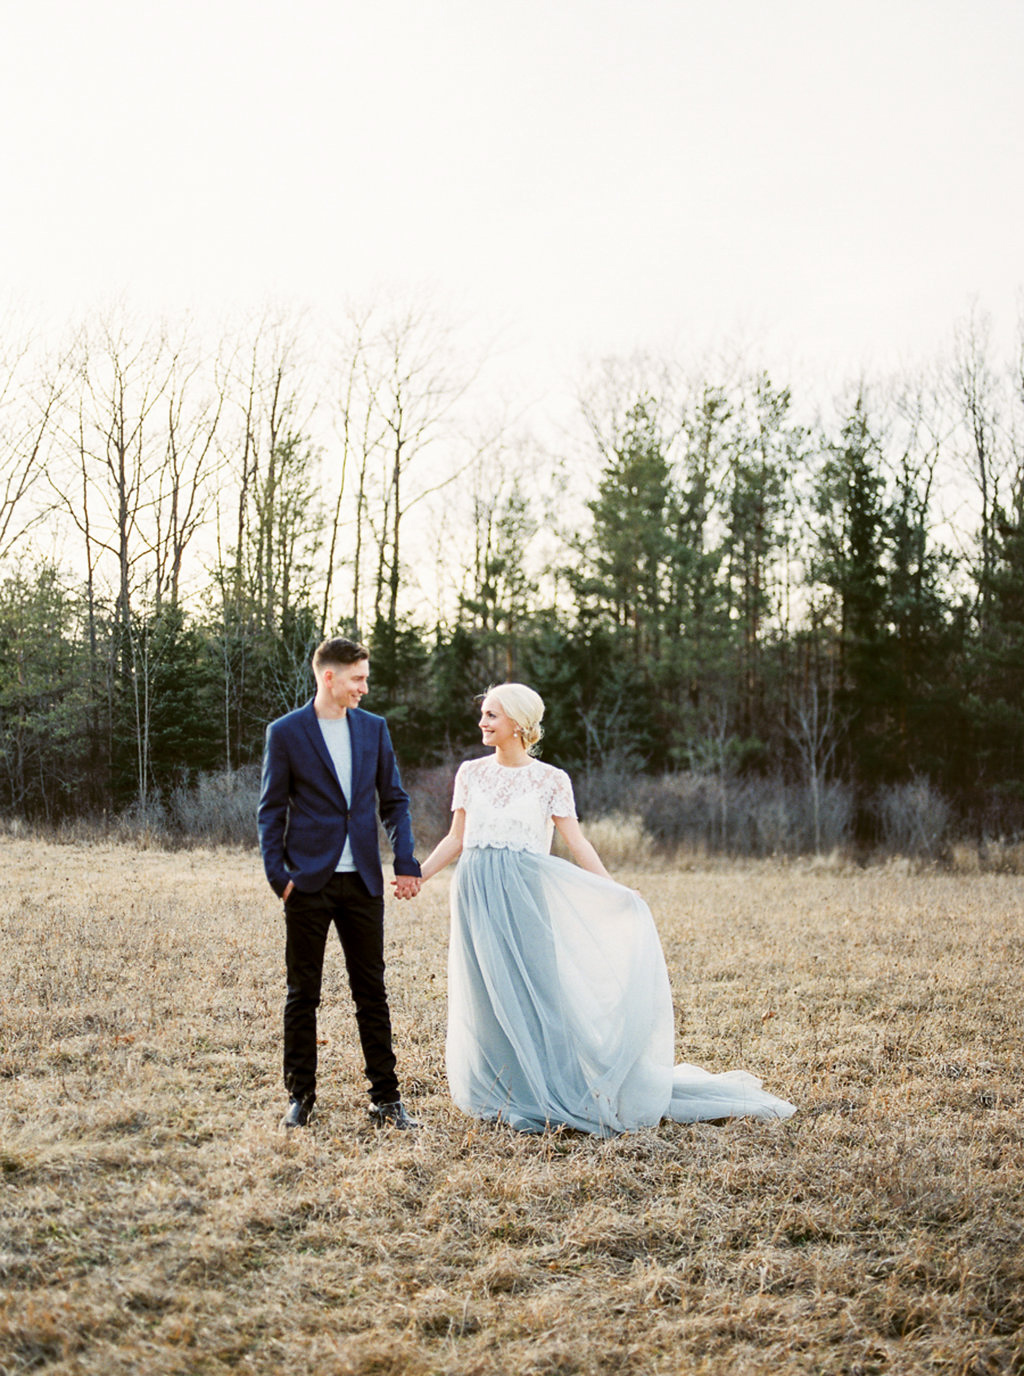 kayla-yestal-photography-vineyard-bride-swish-list-beamer-falls-manor-grimsby-engagement-17.jpg